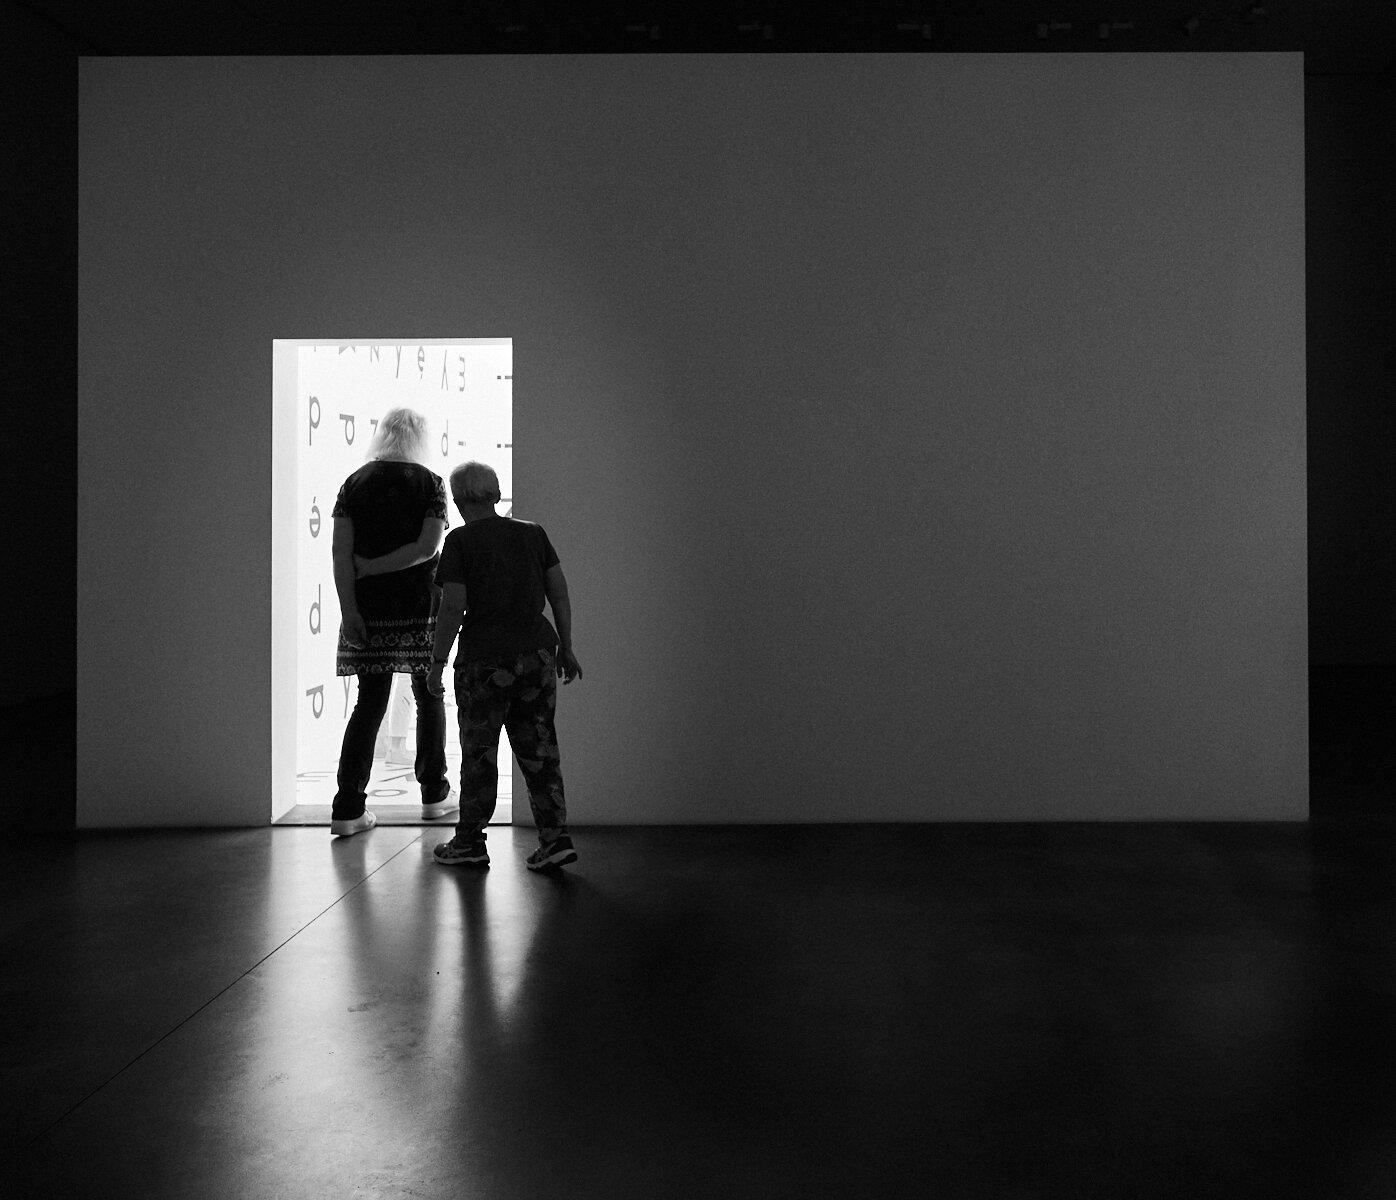 Museum of Contemporary Art light cube 1600x1200 sRGB.jpg